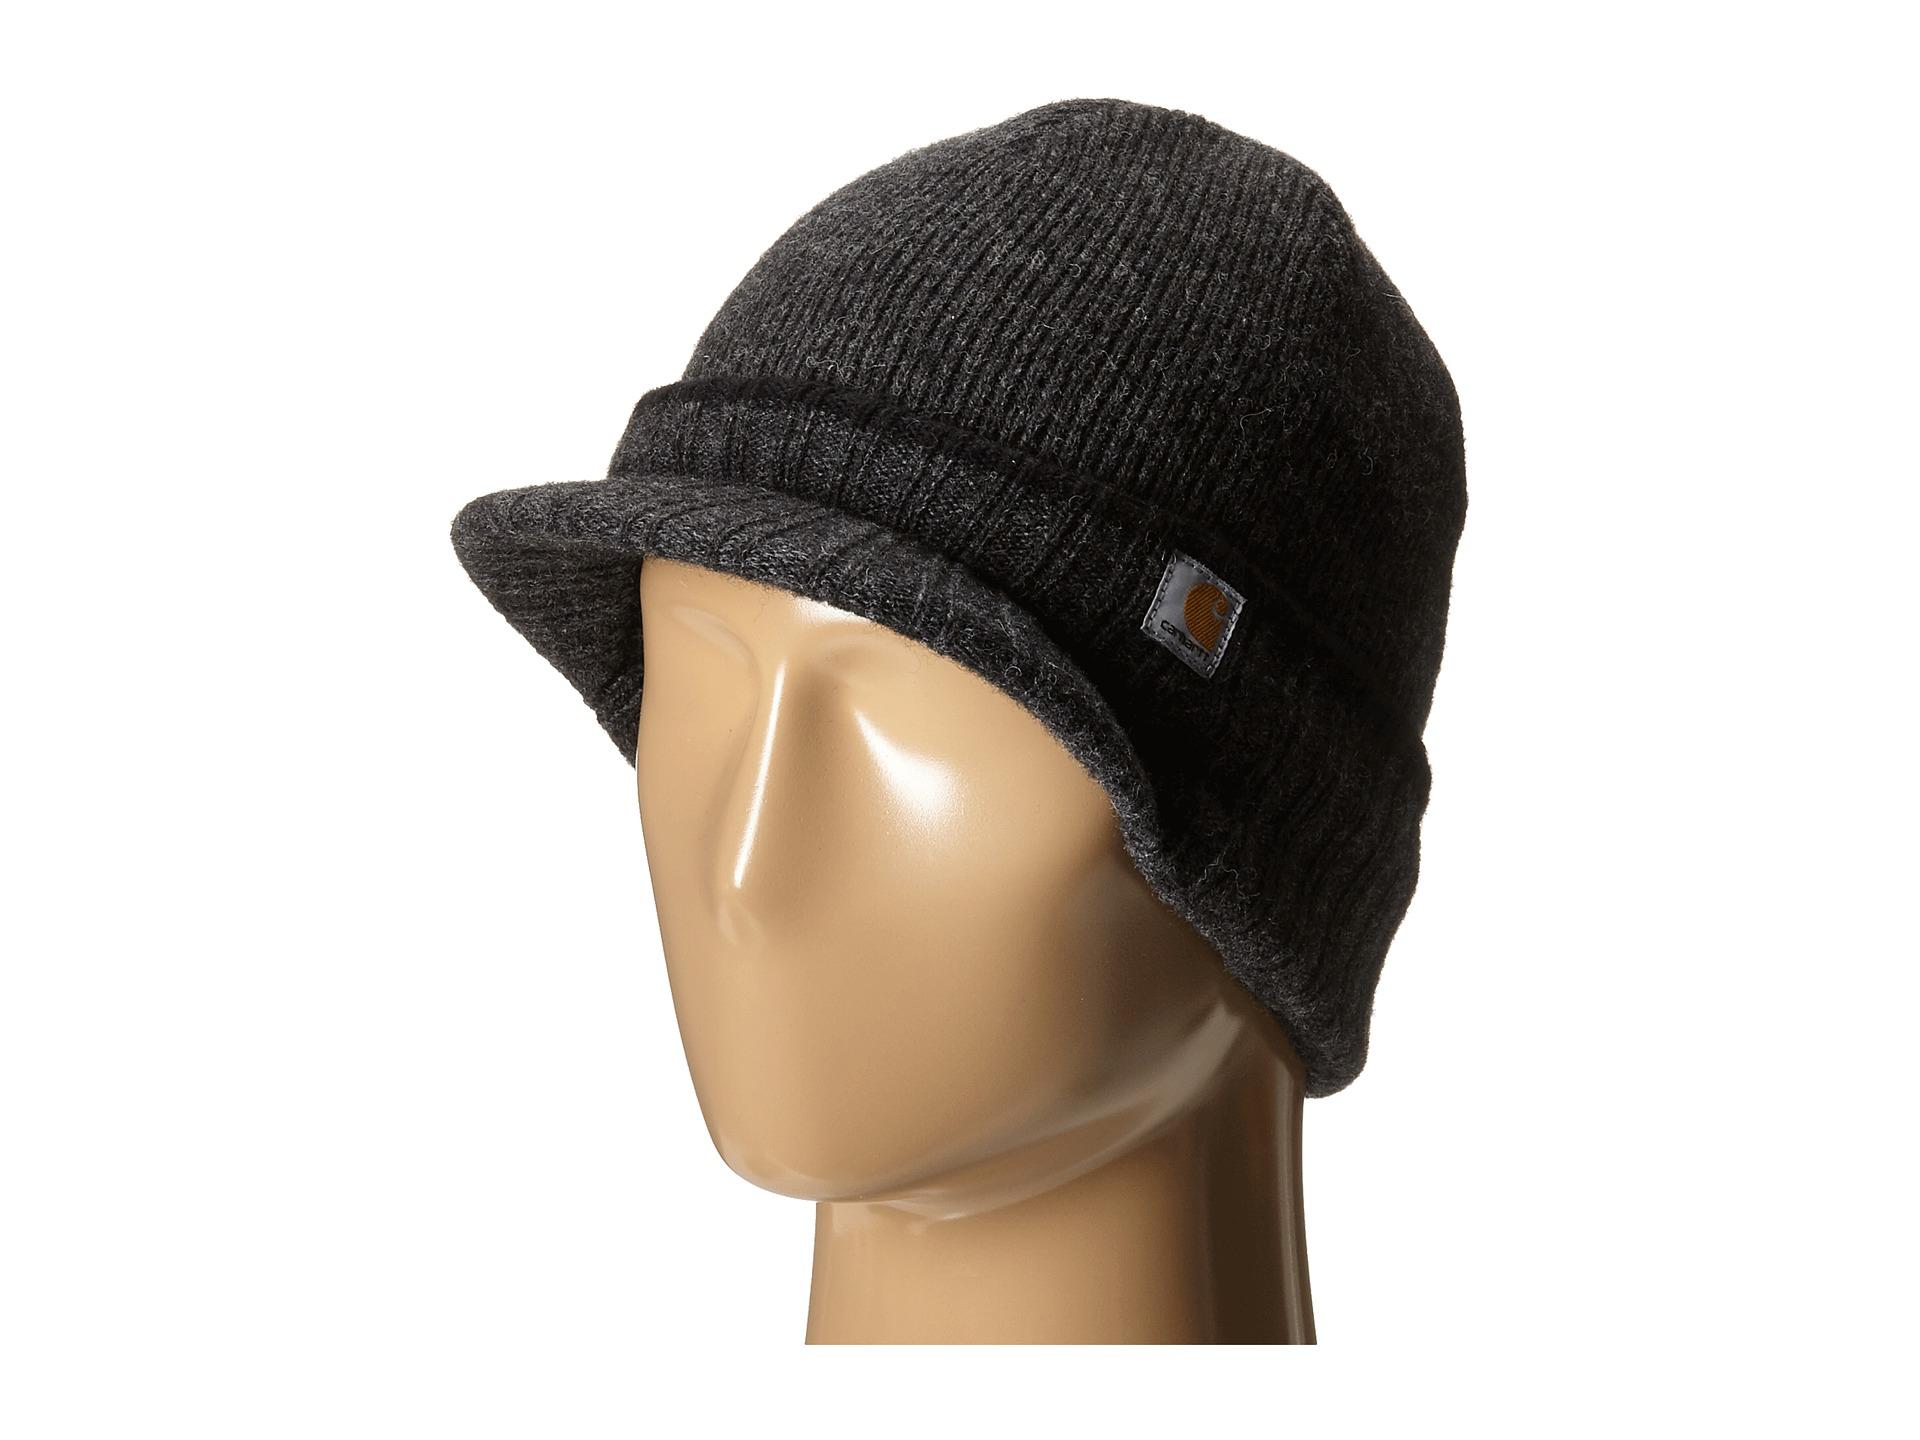 Lyst - Carhartt Marshfield Hat in Gray for Men 425c91fcb53